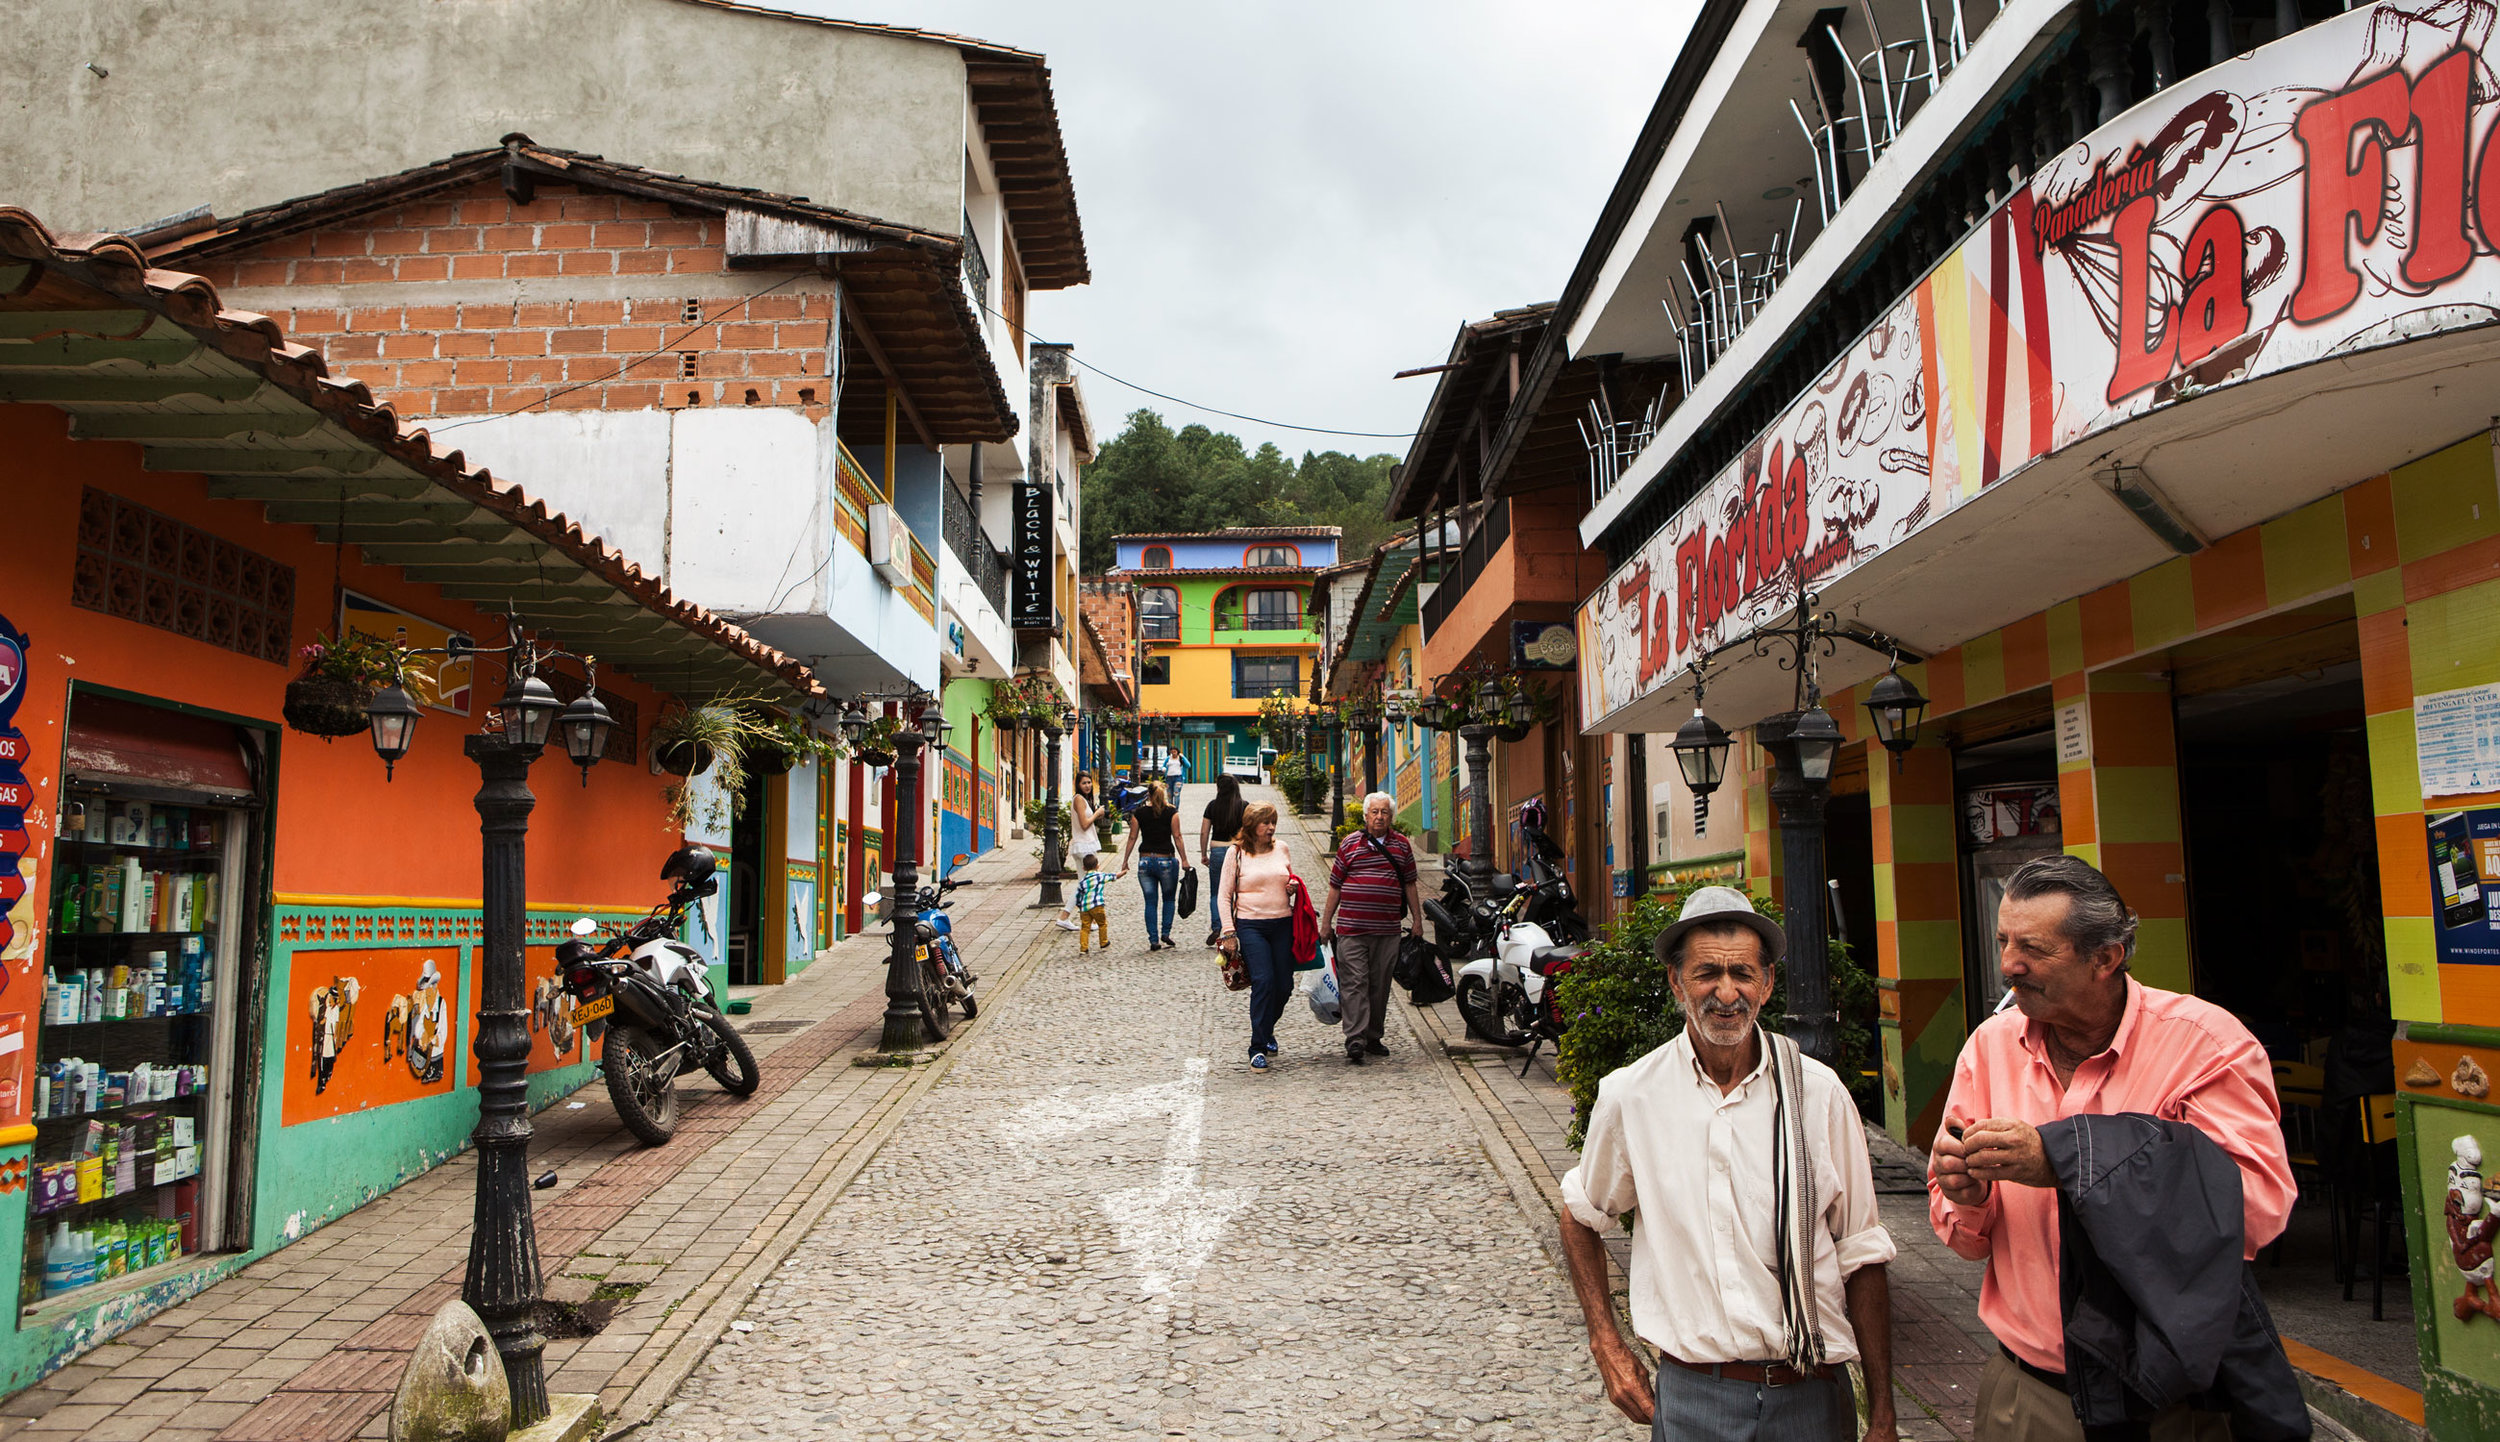 el-penol-guatape-colombia-wander-south-street-1.jpg